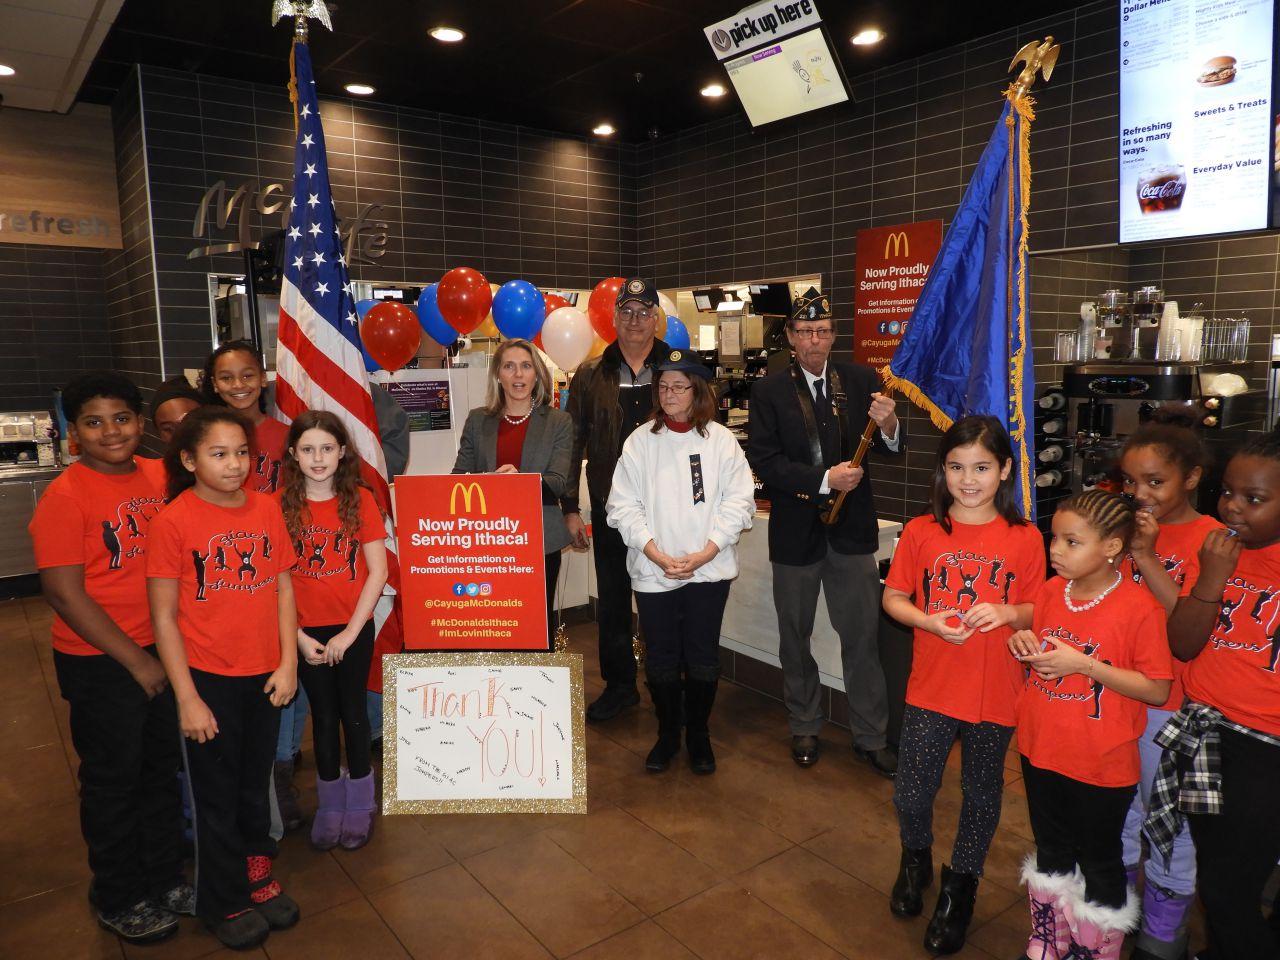 Grand opening at Ithaca McDonald's (photo)